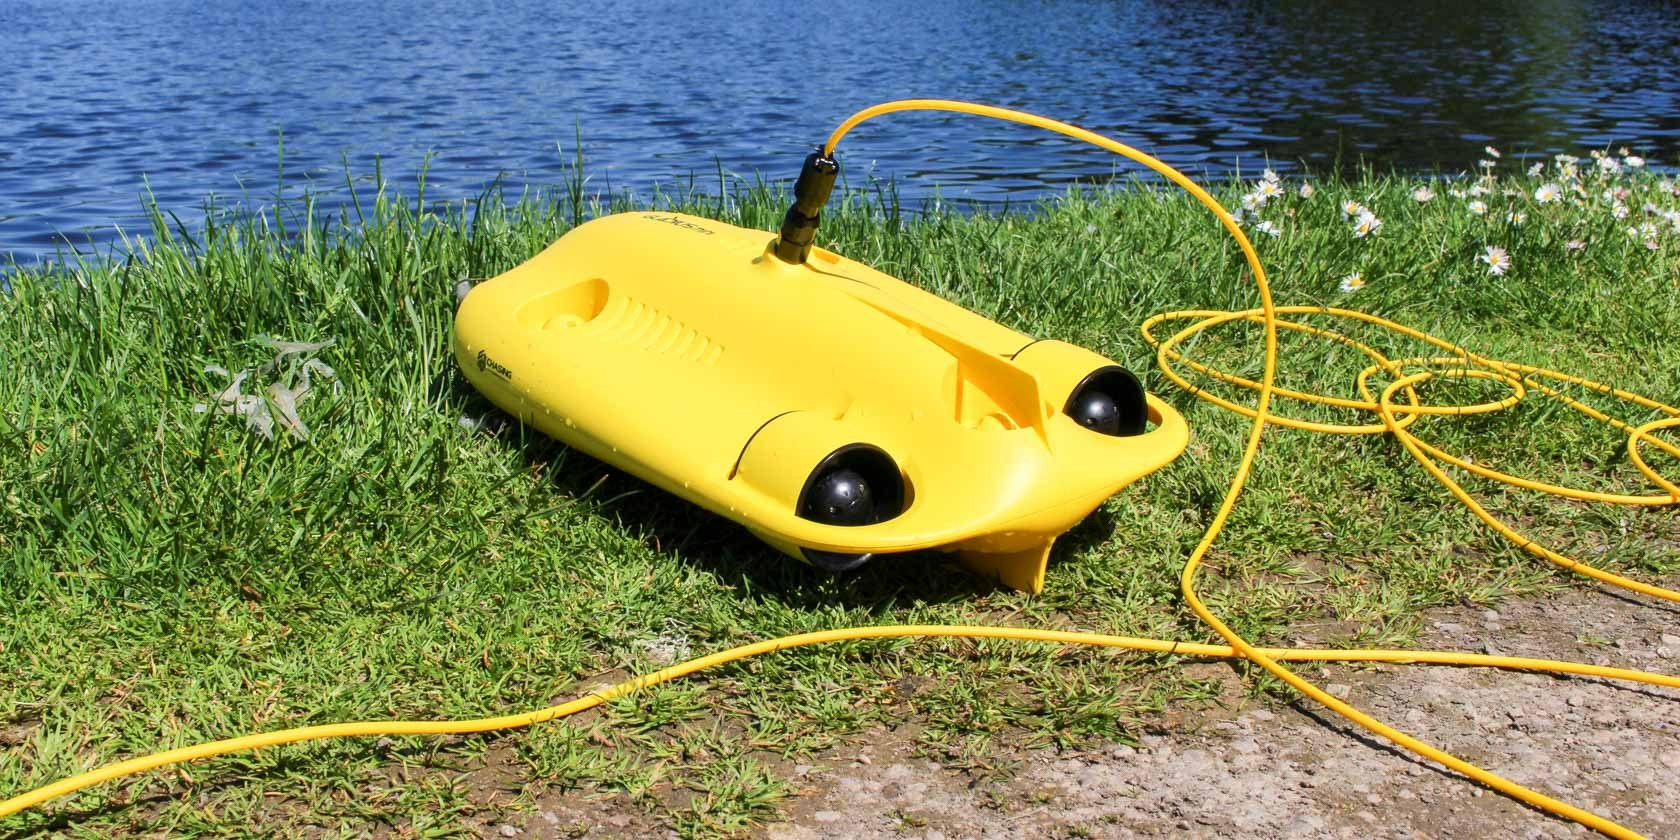 Exploring The Depths, with The Gladius Mini 4K Underwater Drone